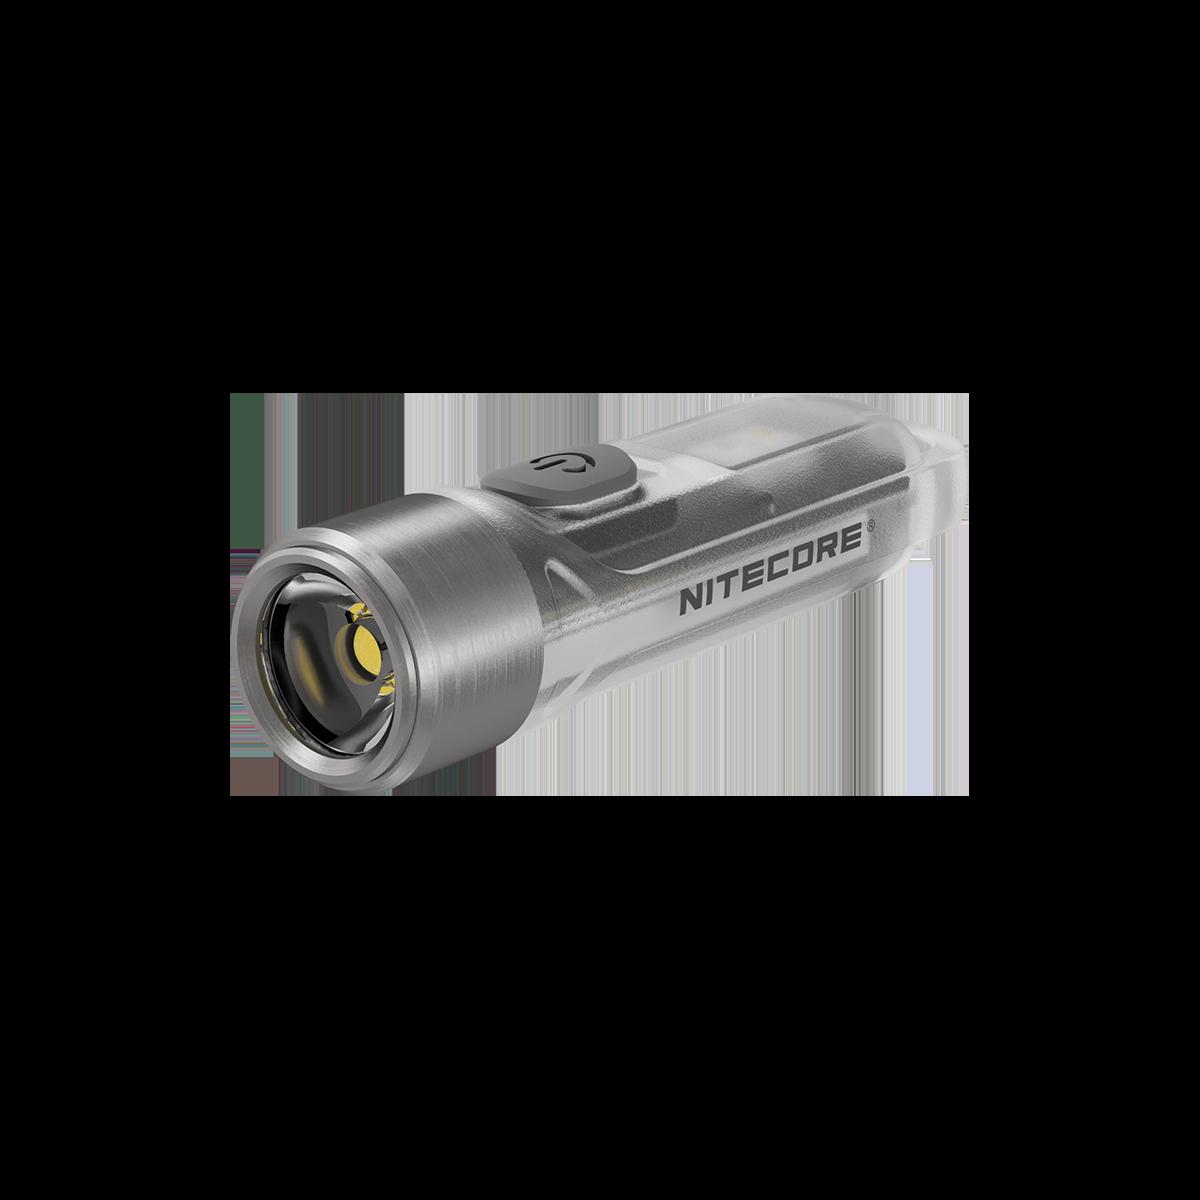 Nitecore MH20GT Flashlight 1000Lm w//NL1834 Battery /& Portable USB charger